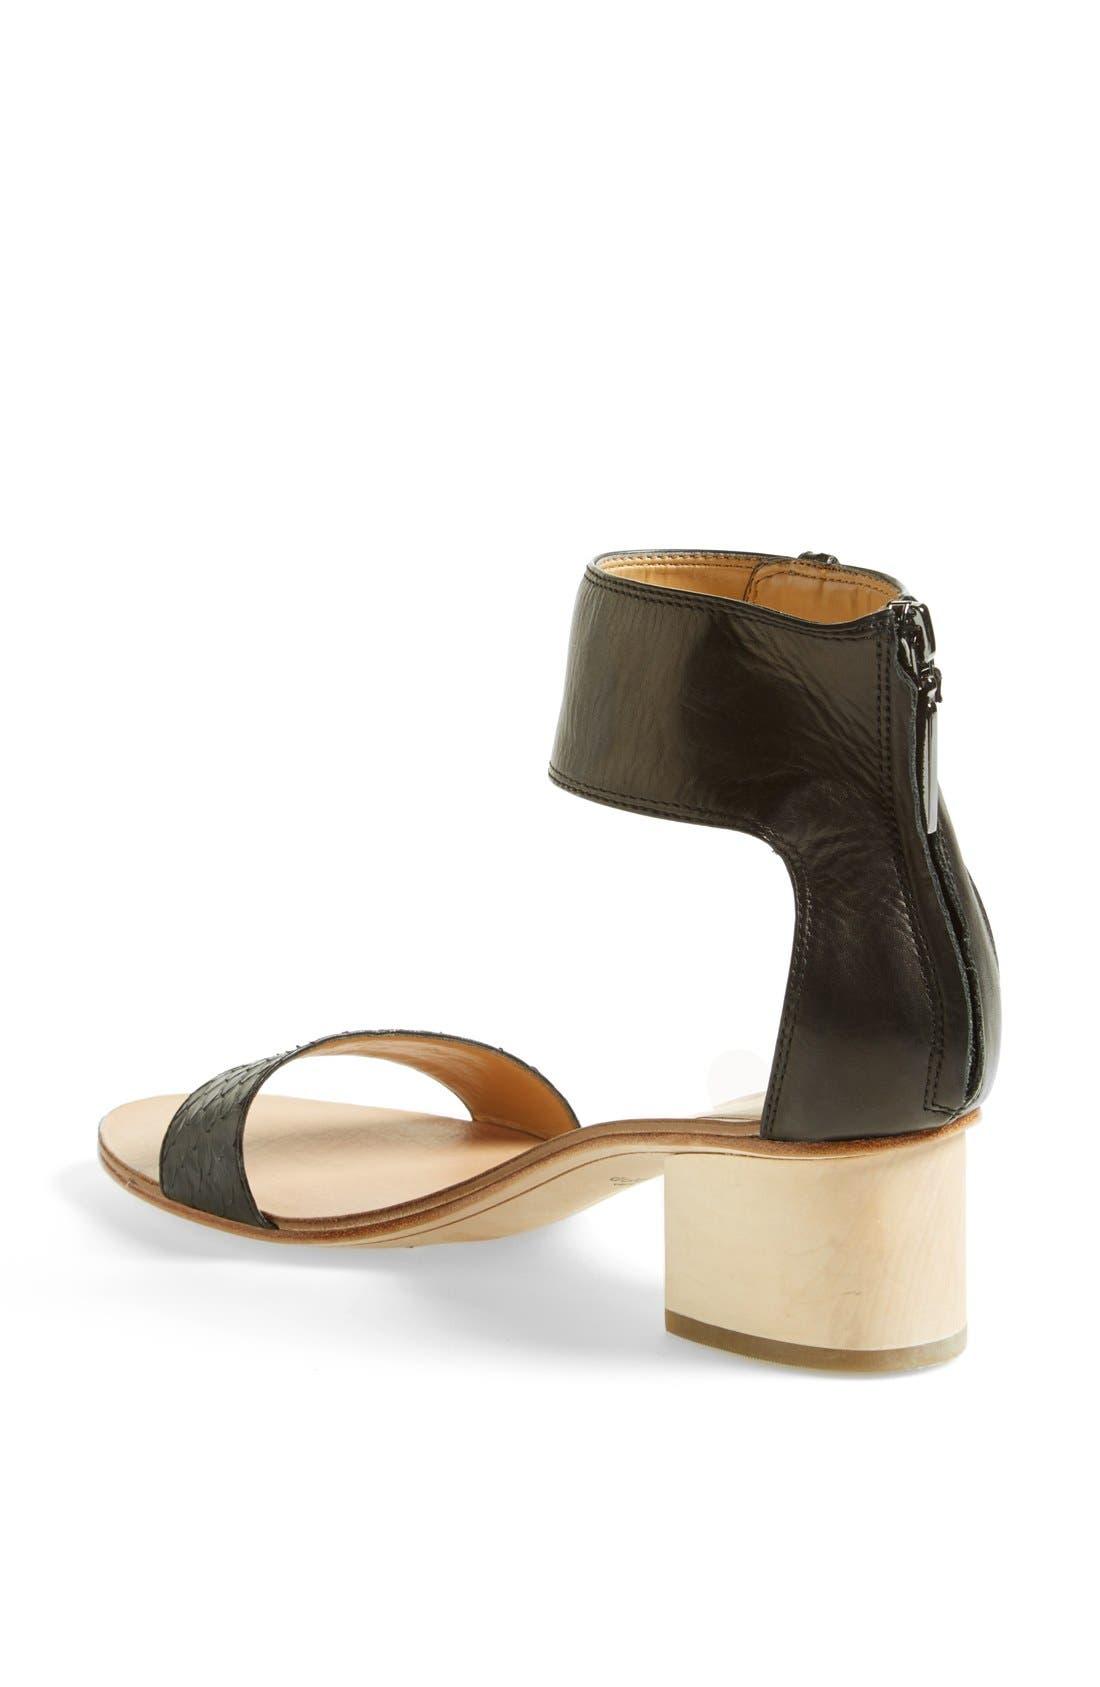 Alternate Image 2  - Dolce Vita 'Foxie' Snakeskin & Leather Sandal